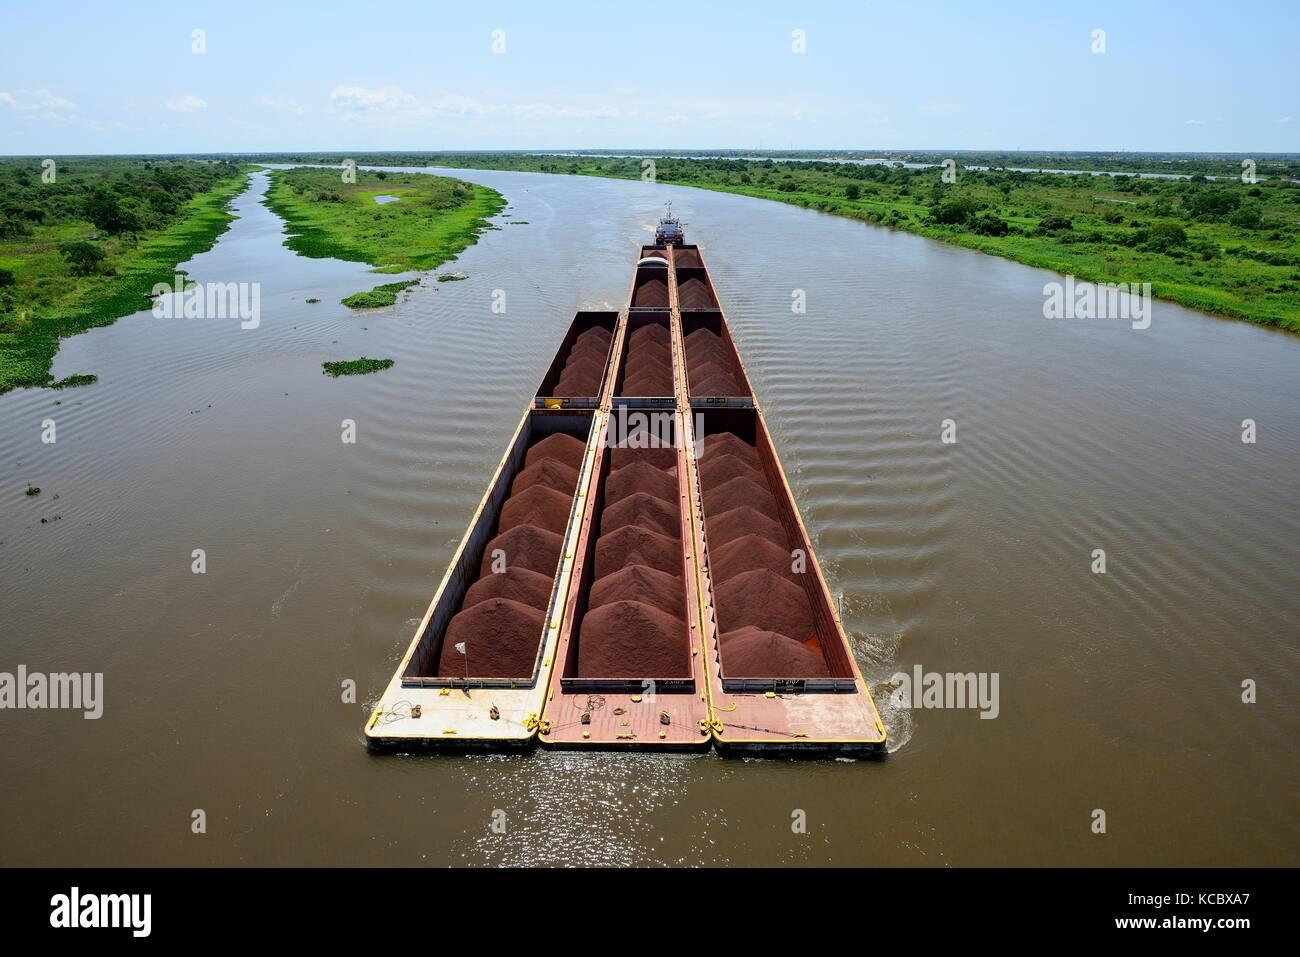 Pusher with iron ore cargo, Rio Paraguay, Concepción, Paraguay - Stock Image